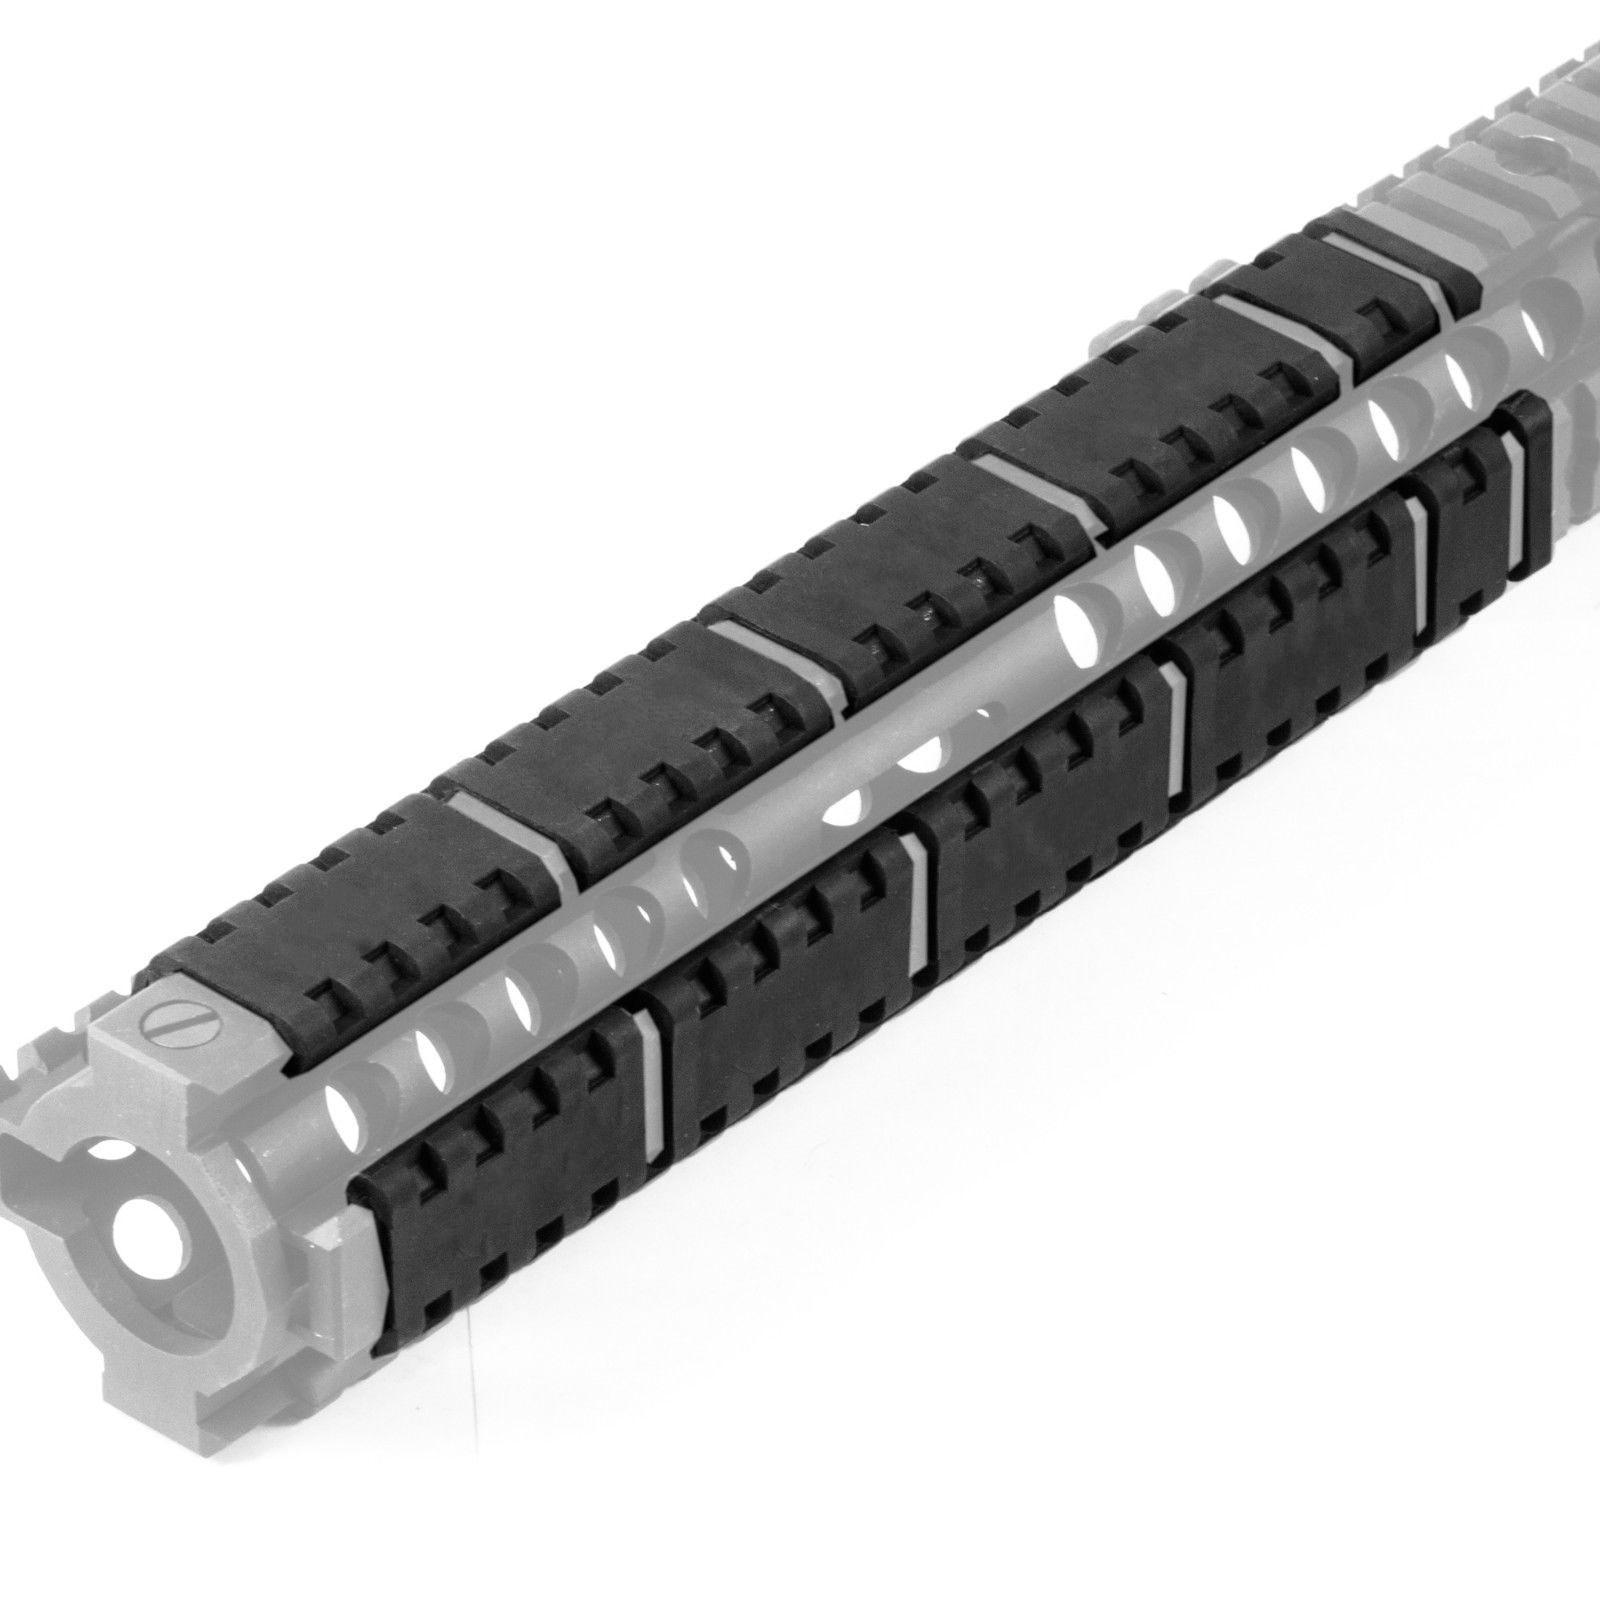 New 20 pcs Hunting rifle Handguard Rail Covers Guard Weaver for ar15 M4 any 20mm Rail (20 Piece Set) Heat Resistent Nonslip(China)